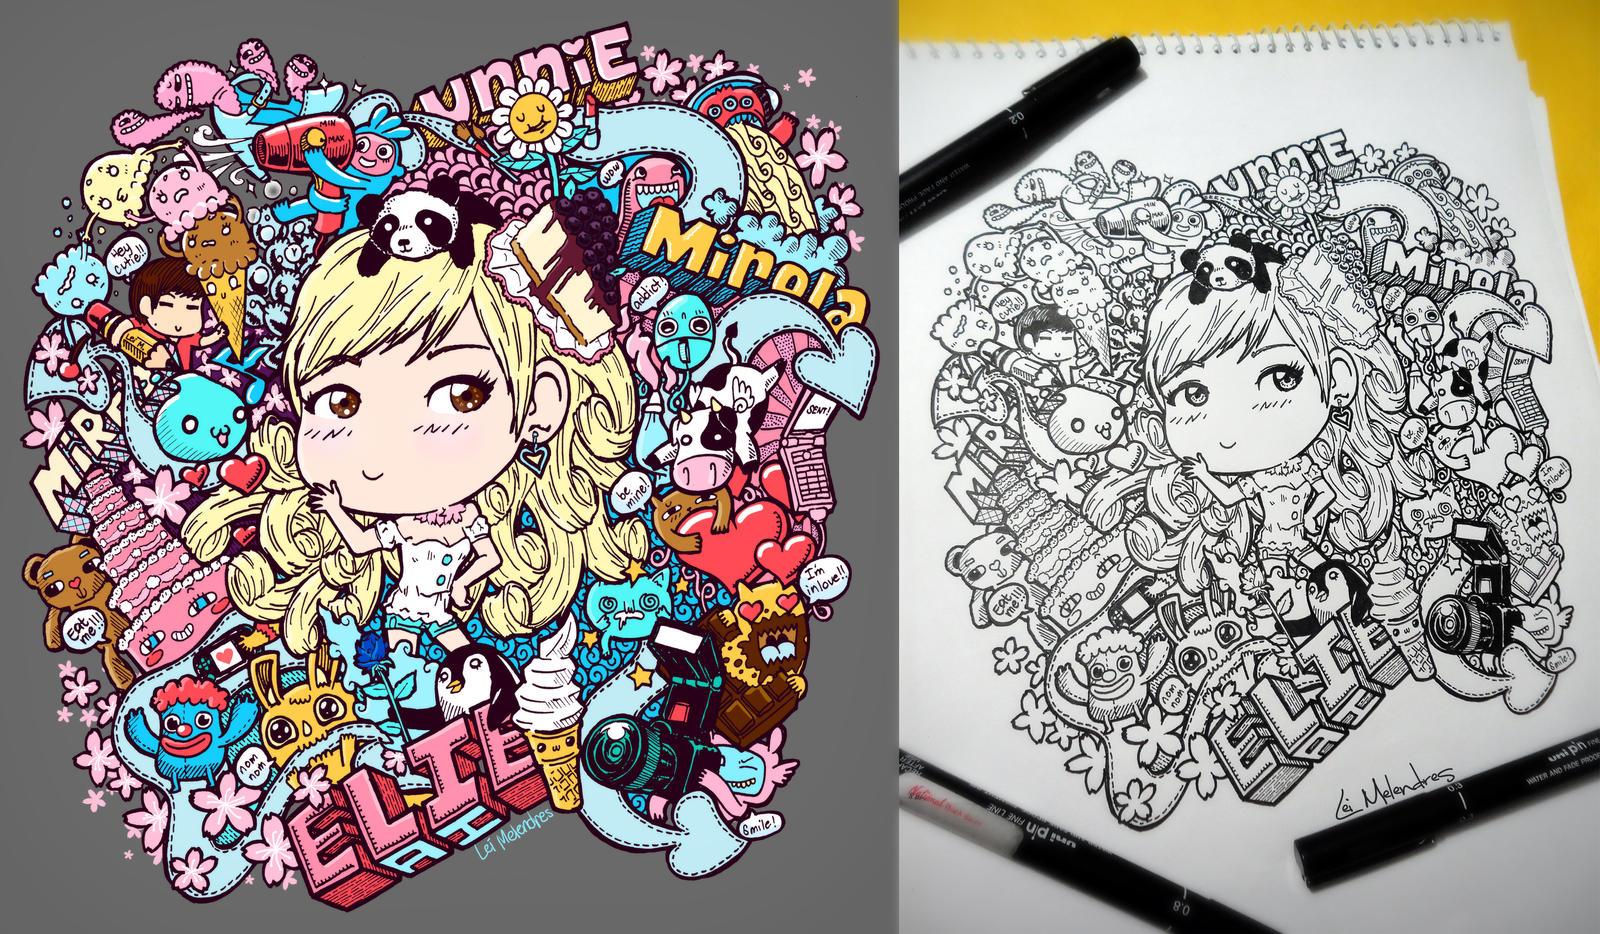 Doodle Blondie by LeiMelendres